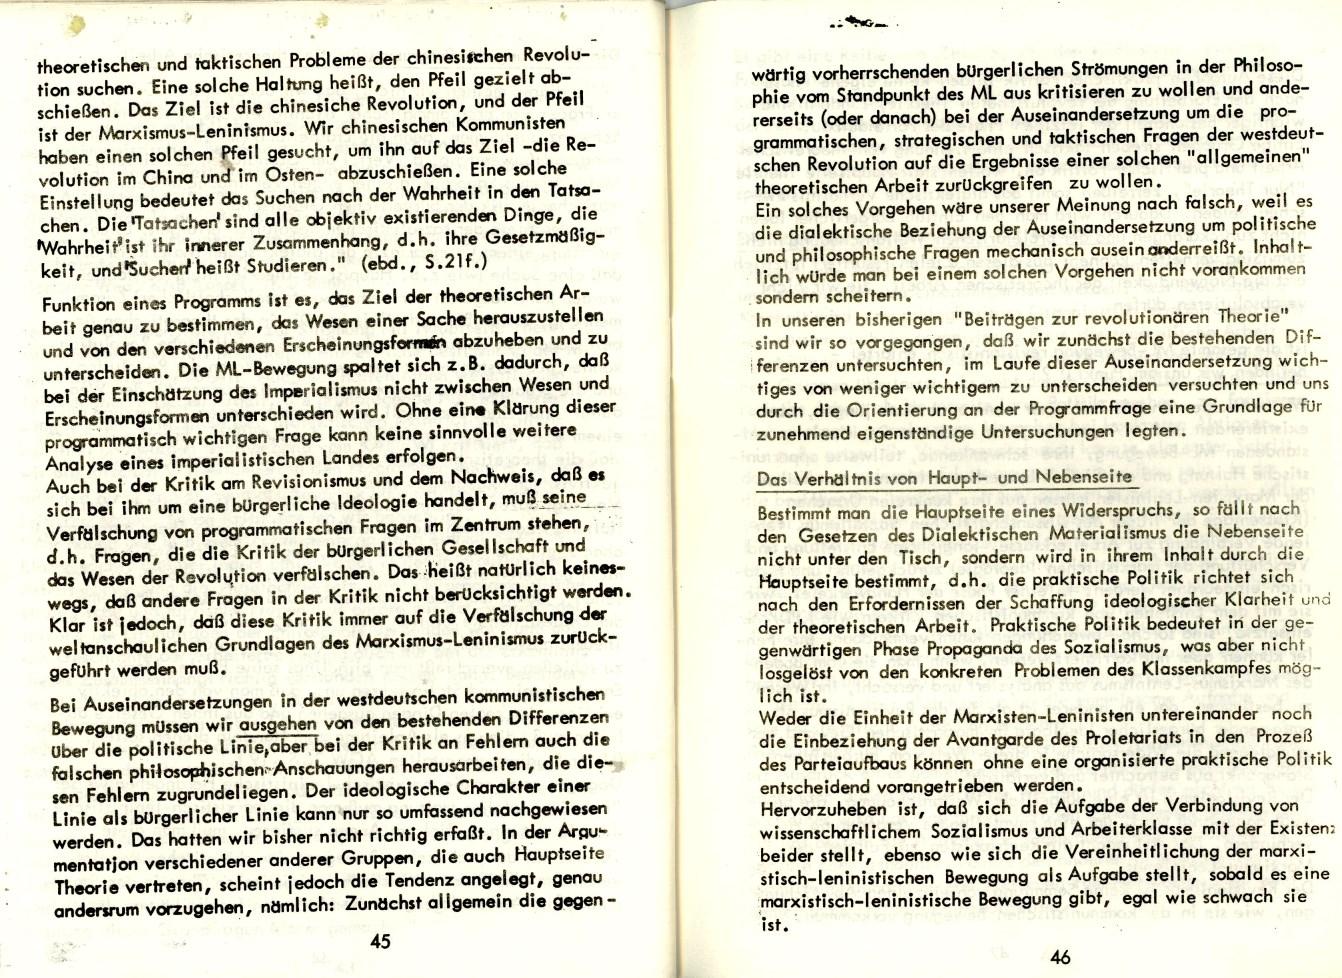 KGBE_1978_Resolutionen_24